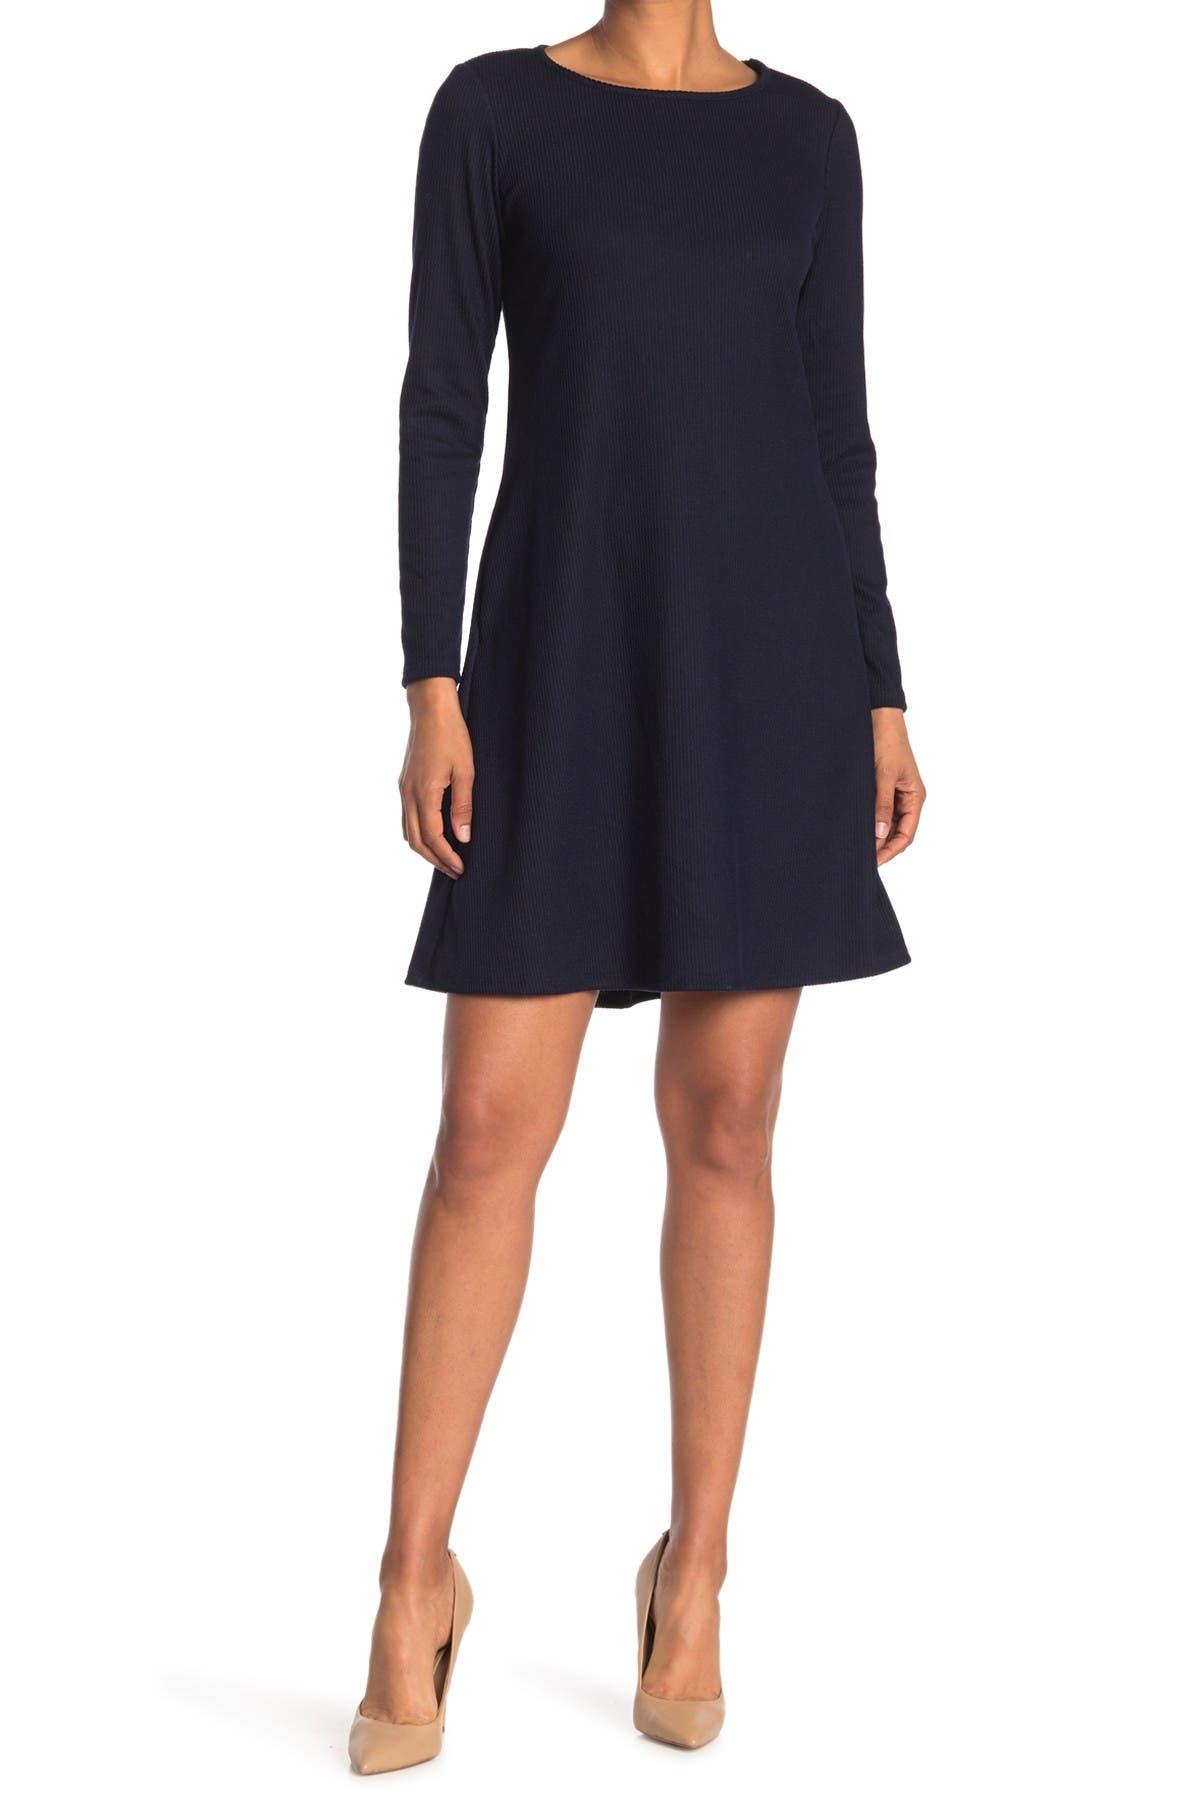 Image of TASH + SOPHIE Long Sleeve A-Line Dress